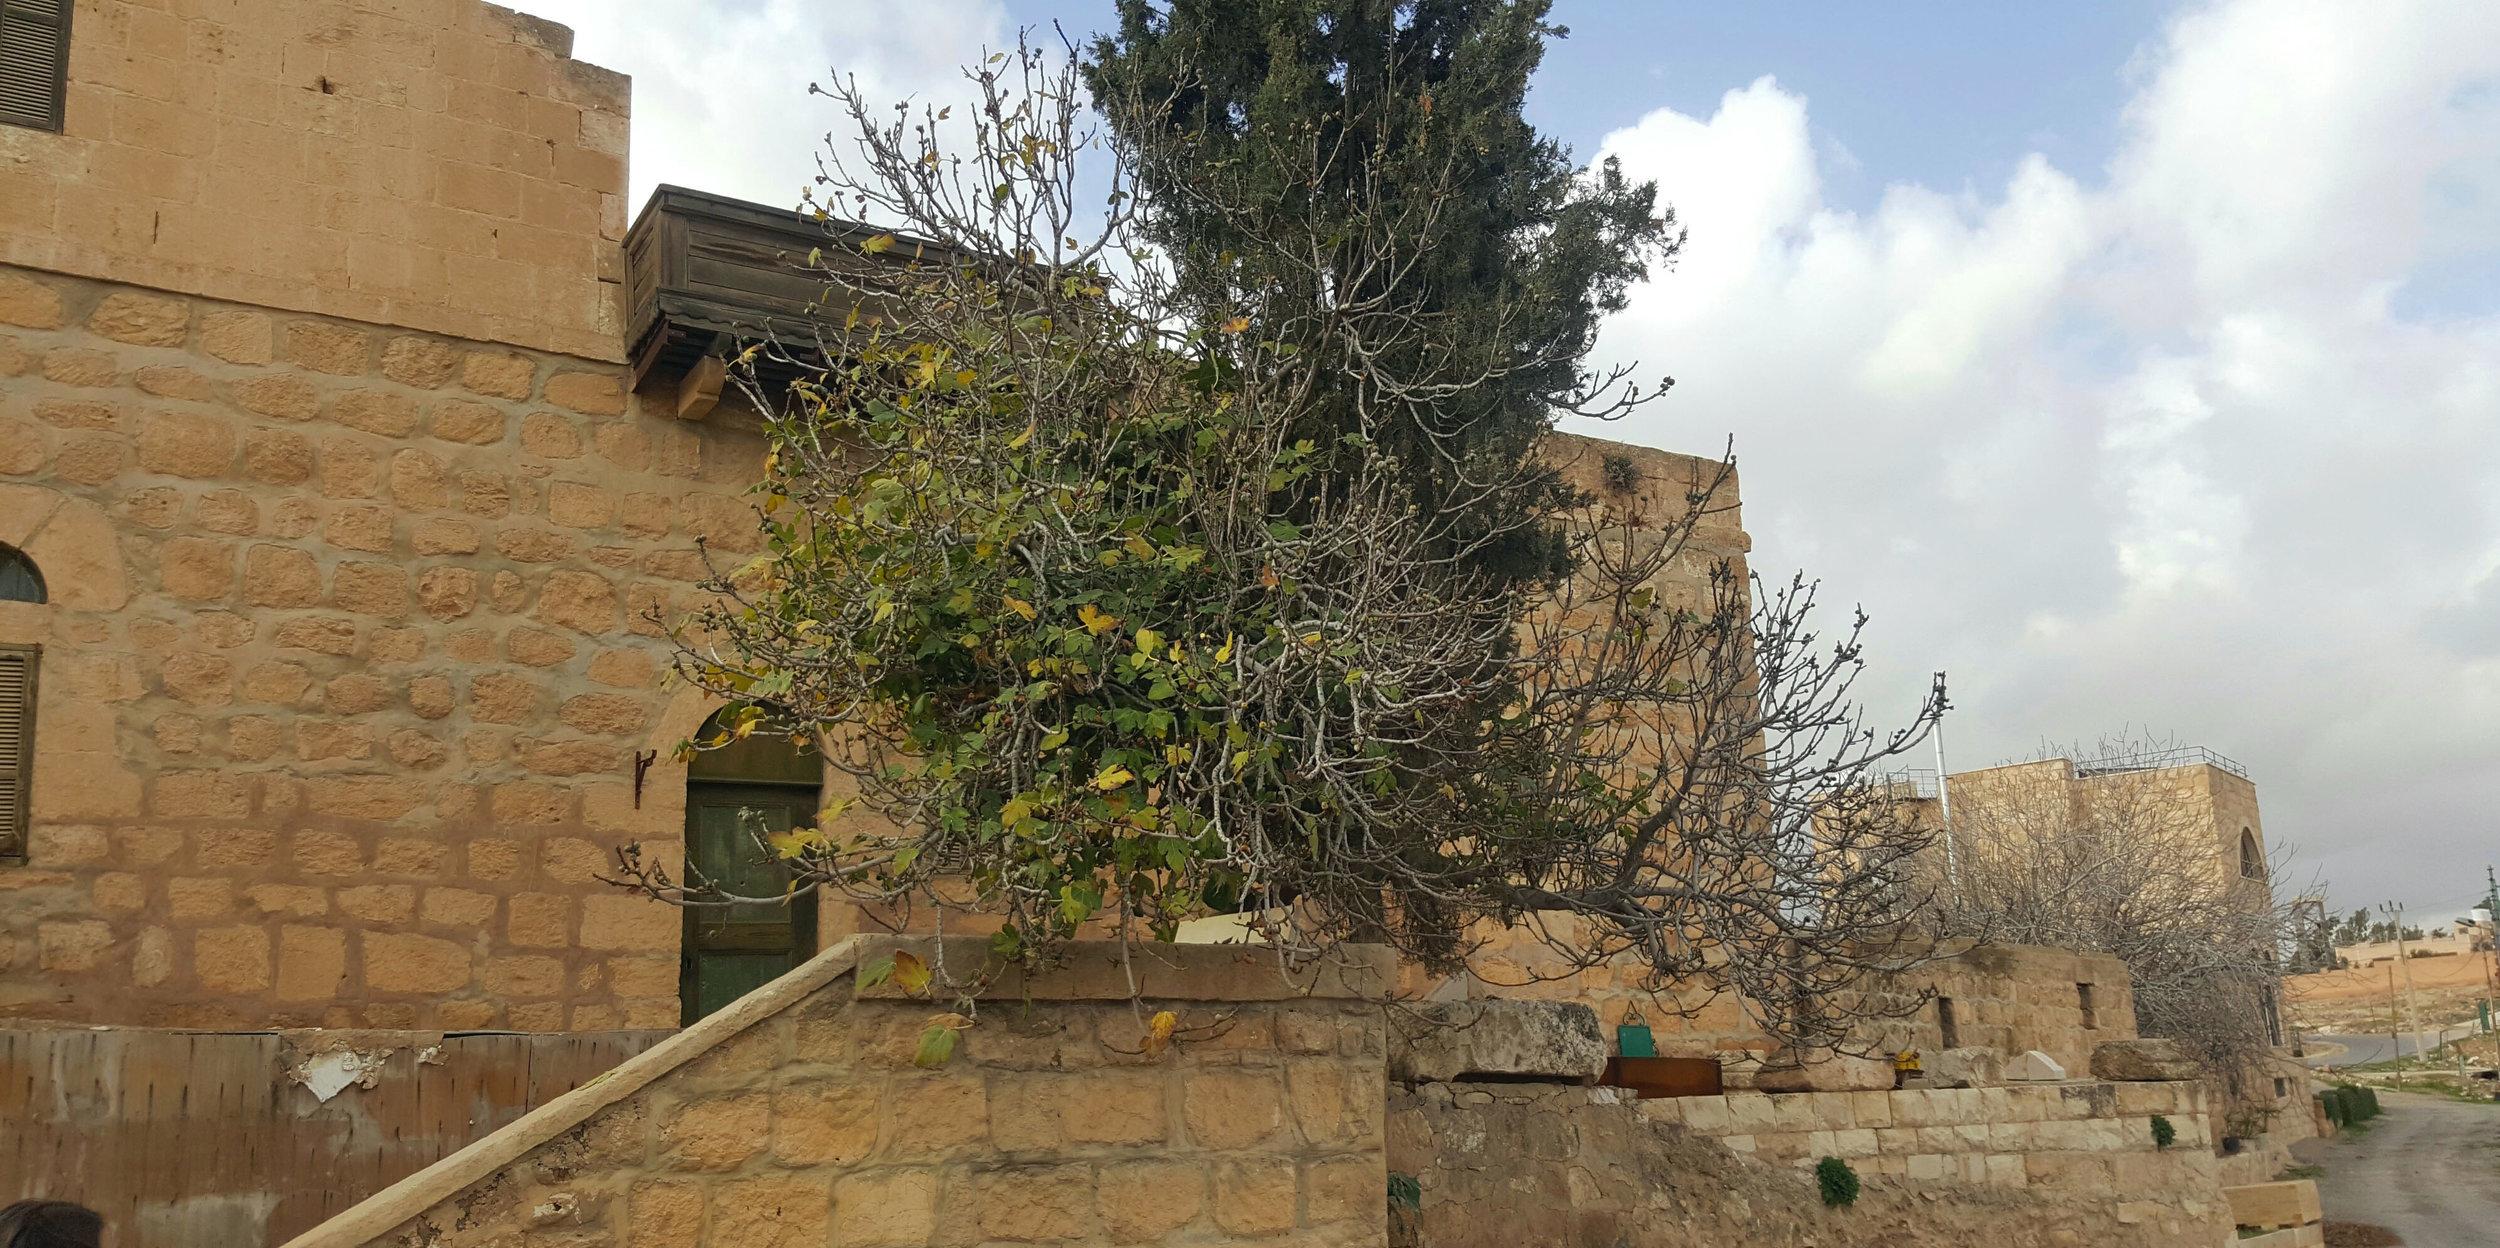 The oldest known built house in Jordan, la Yazal,  in  Um el Kundum area (or mother of grain in Aramaic)